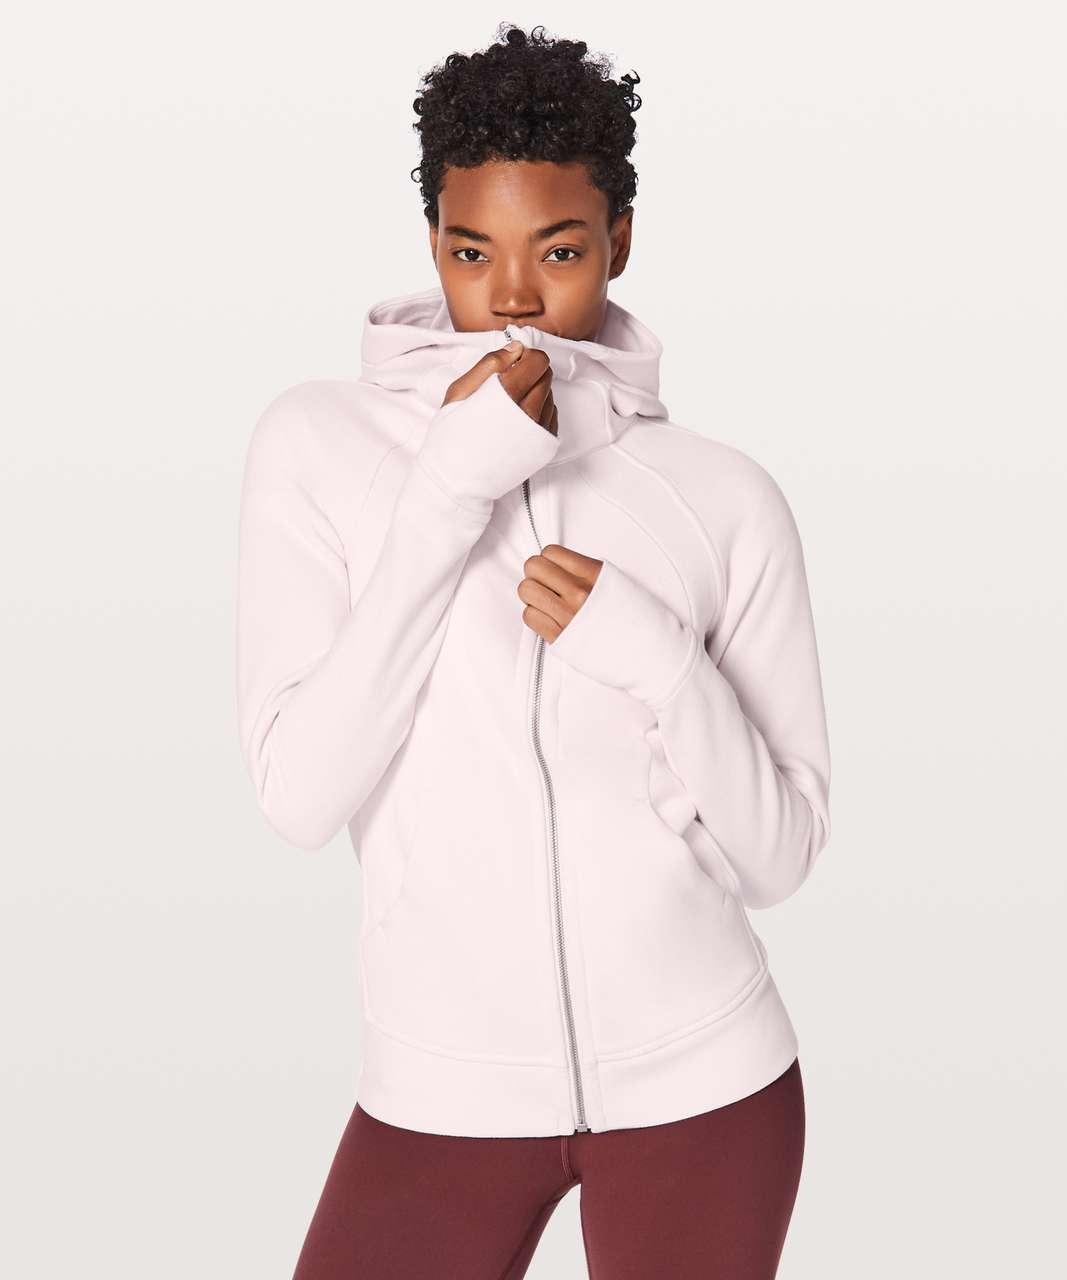 Lululemon Scuba Hoodie *Light Cotton Fleece - Flutterby Pink (First Release)